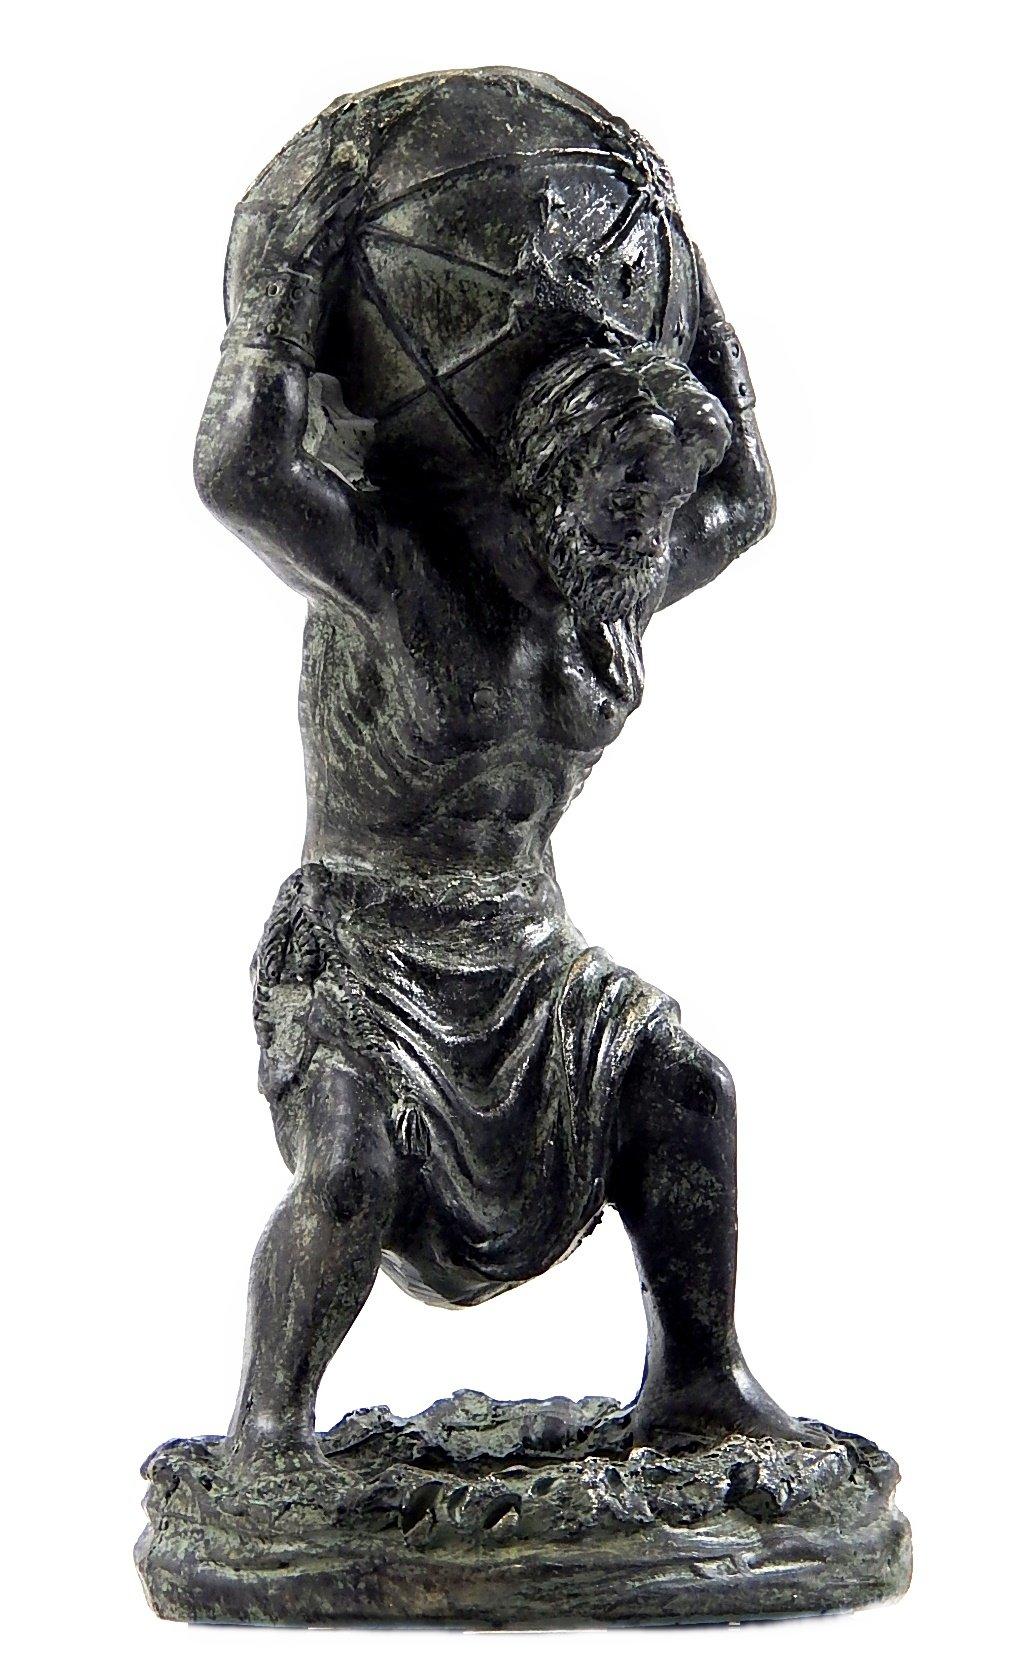 Bellaa 22692 Atlas Holding World Greek Statue, Greek Mythology Statue